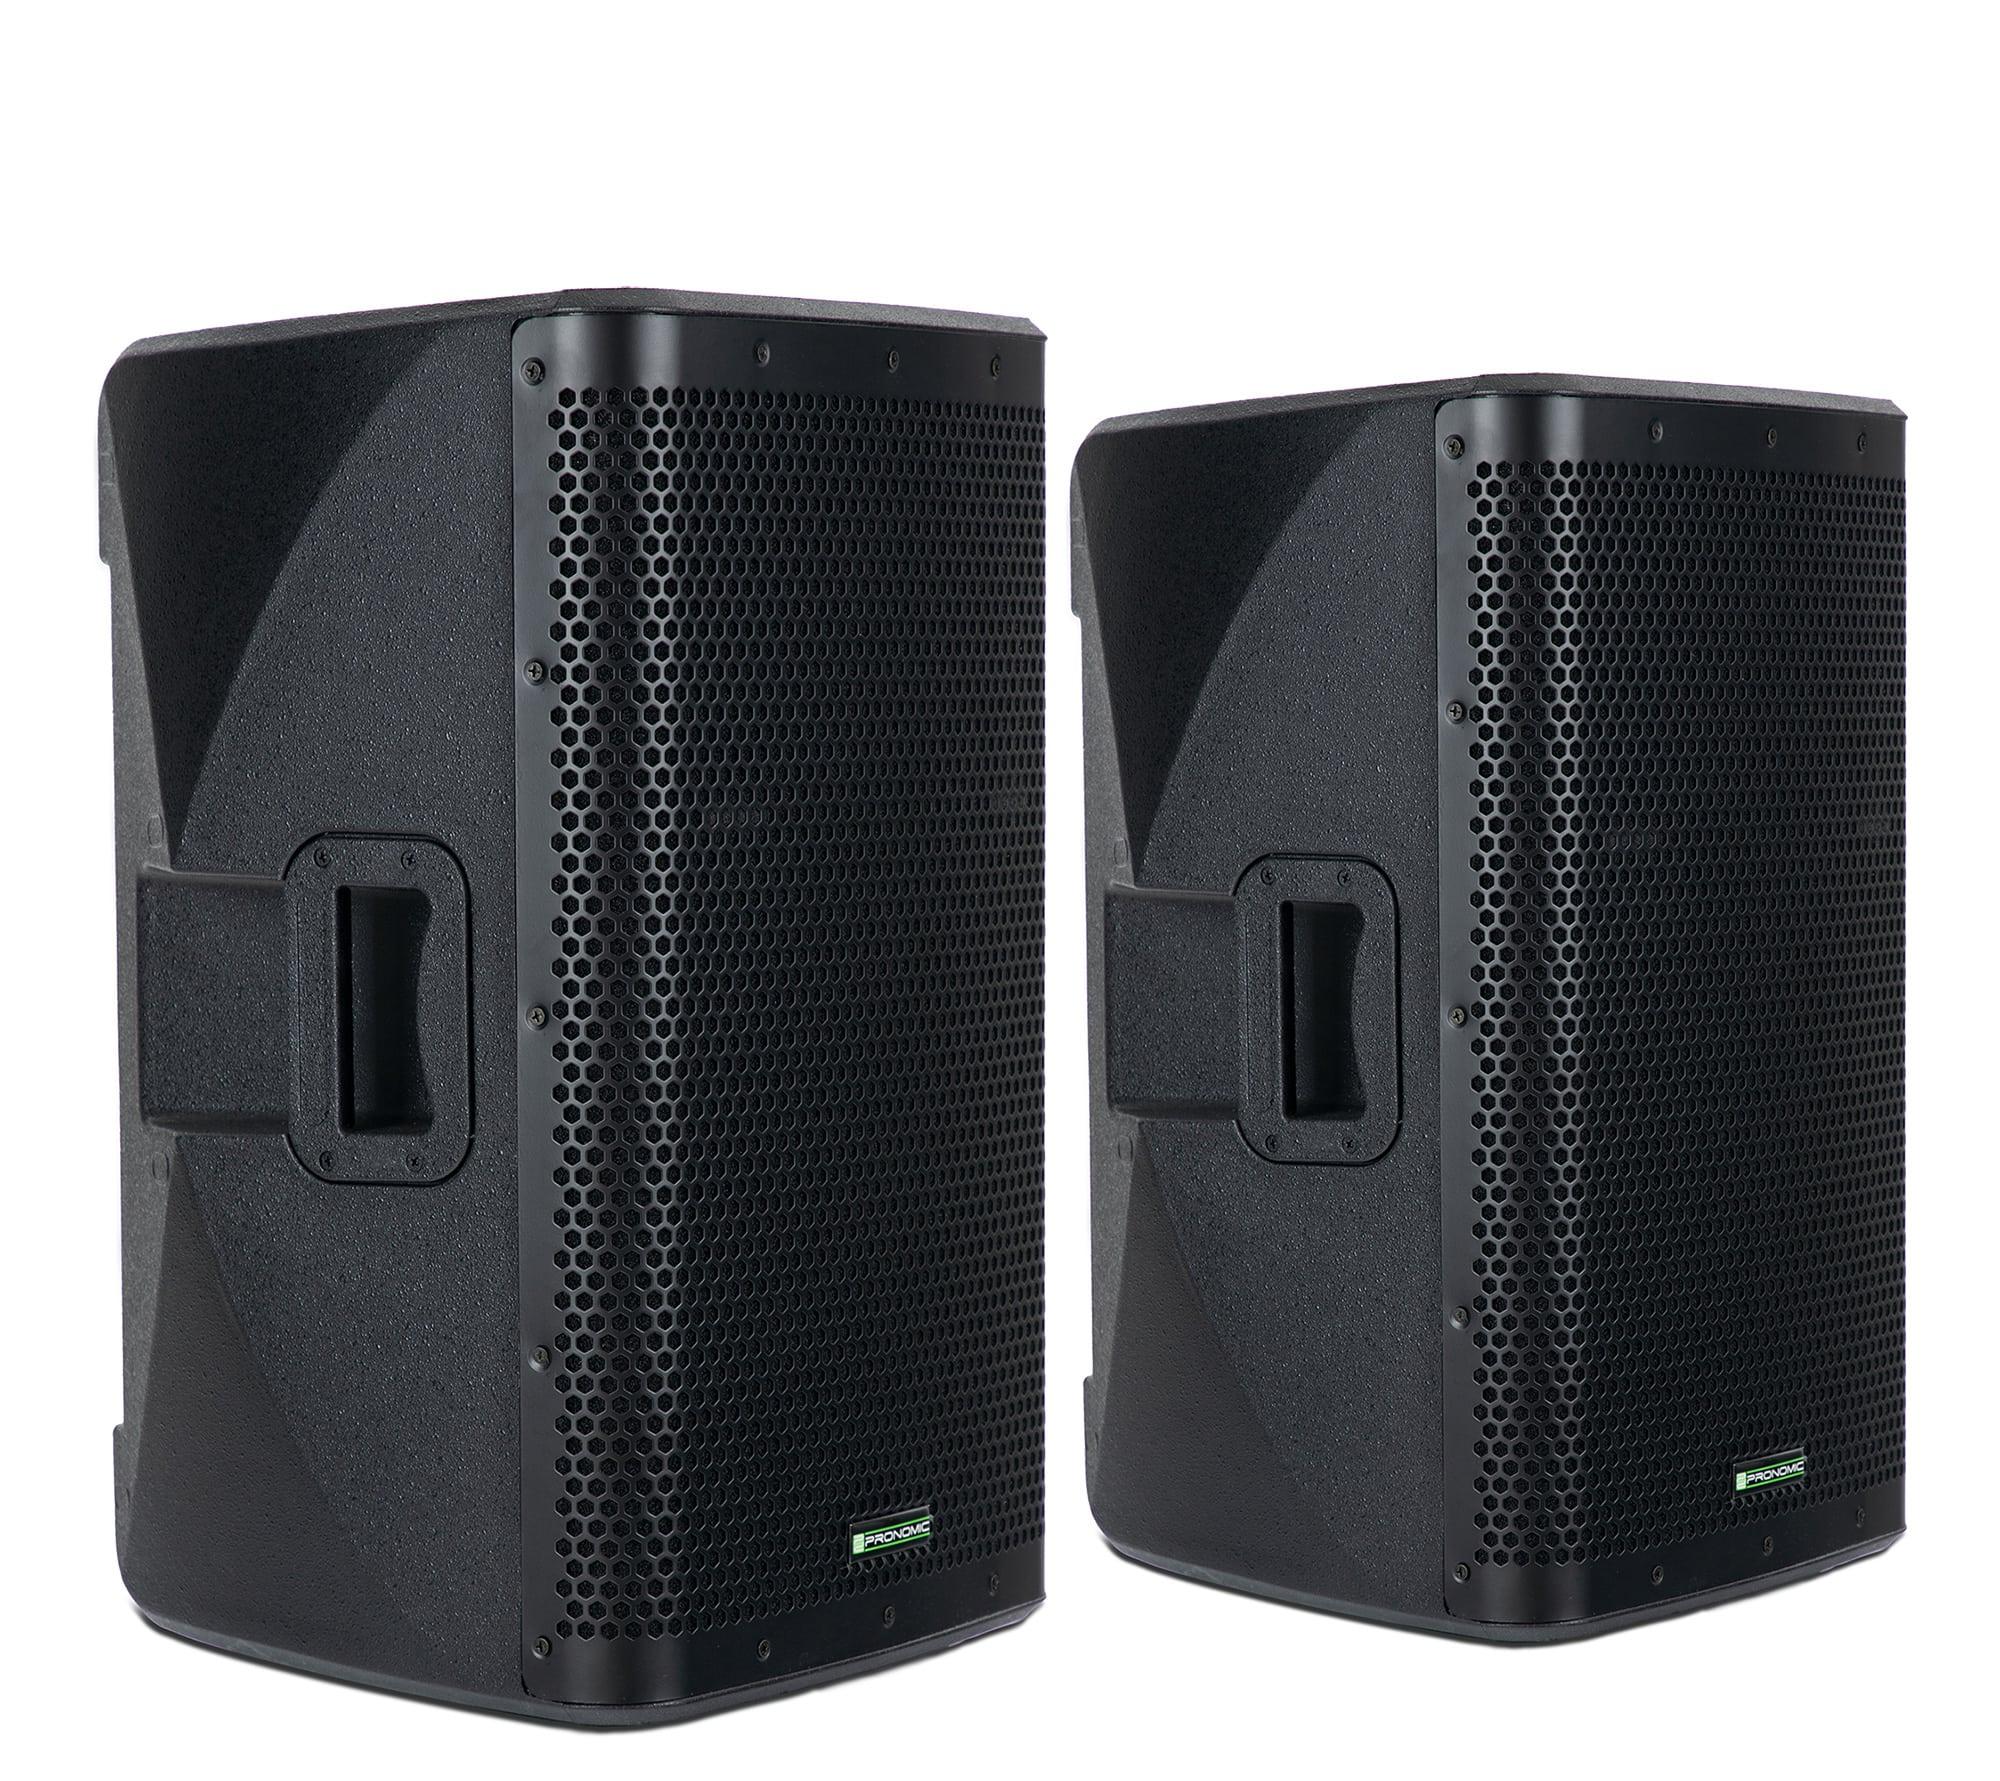 Paboxen - Pronomic C 212 MA 12 Aktivbox 2000 Watt Stereo Set - Onlineshop Musikhaus Kirstein